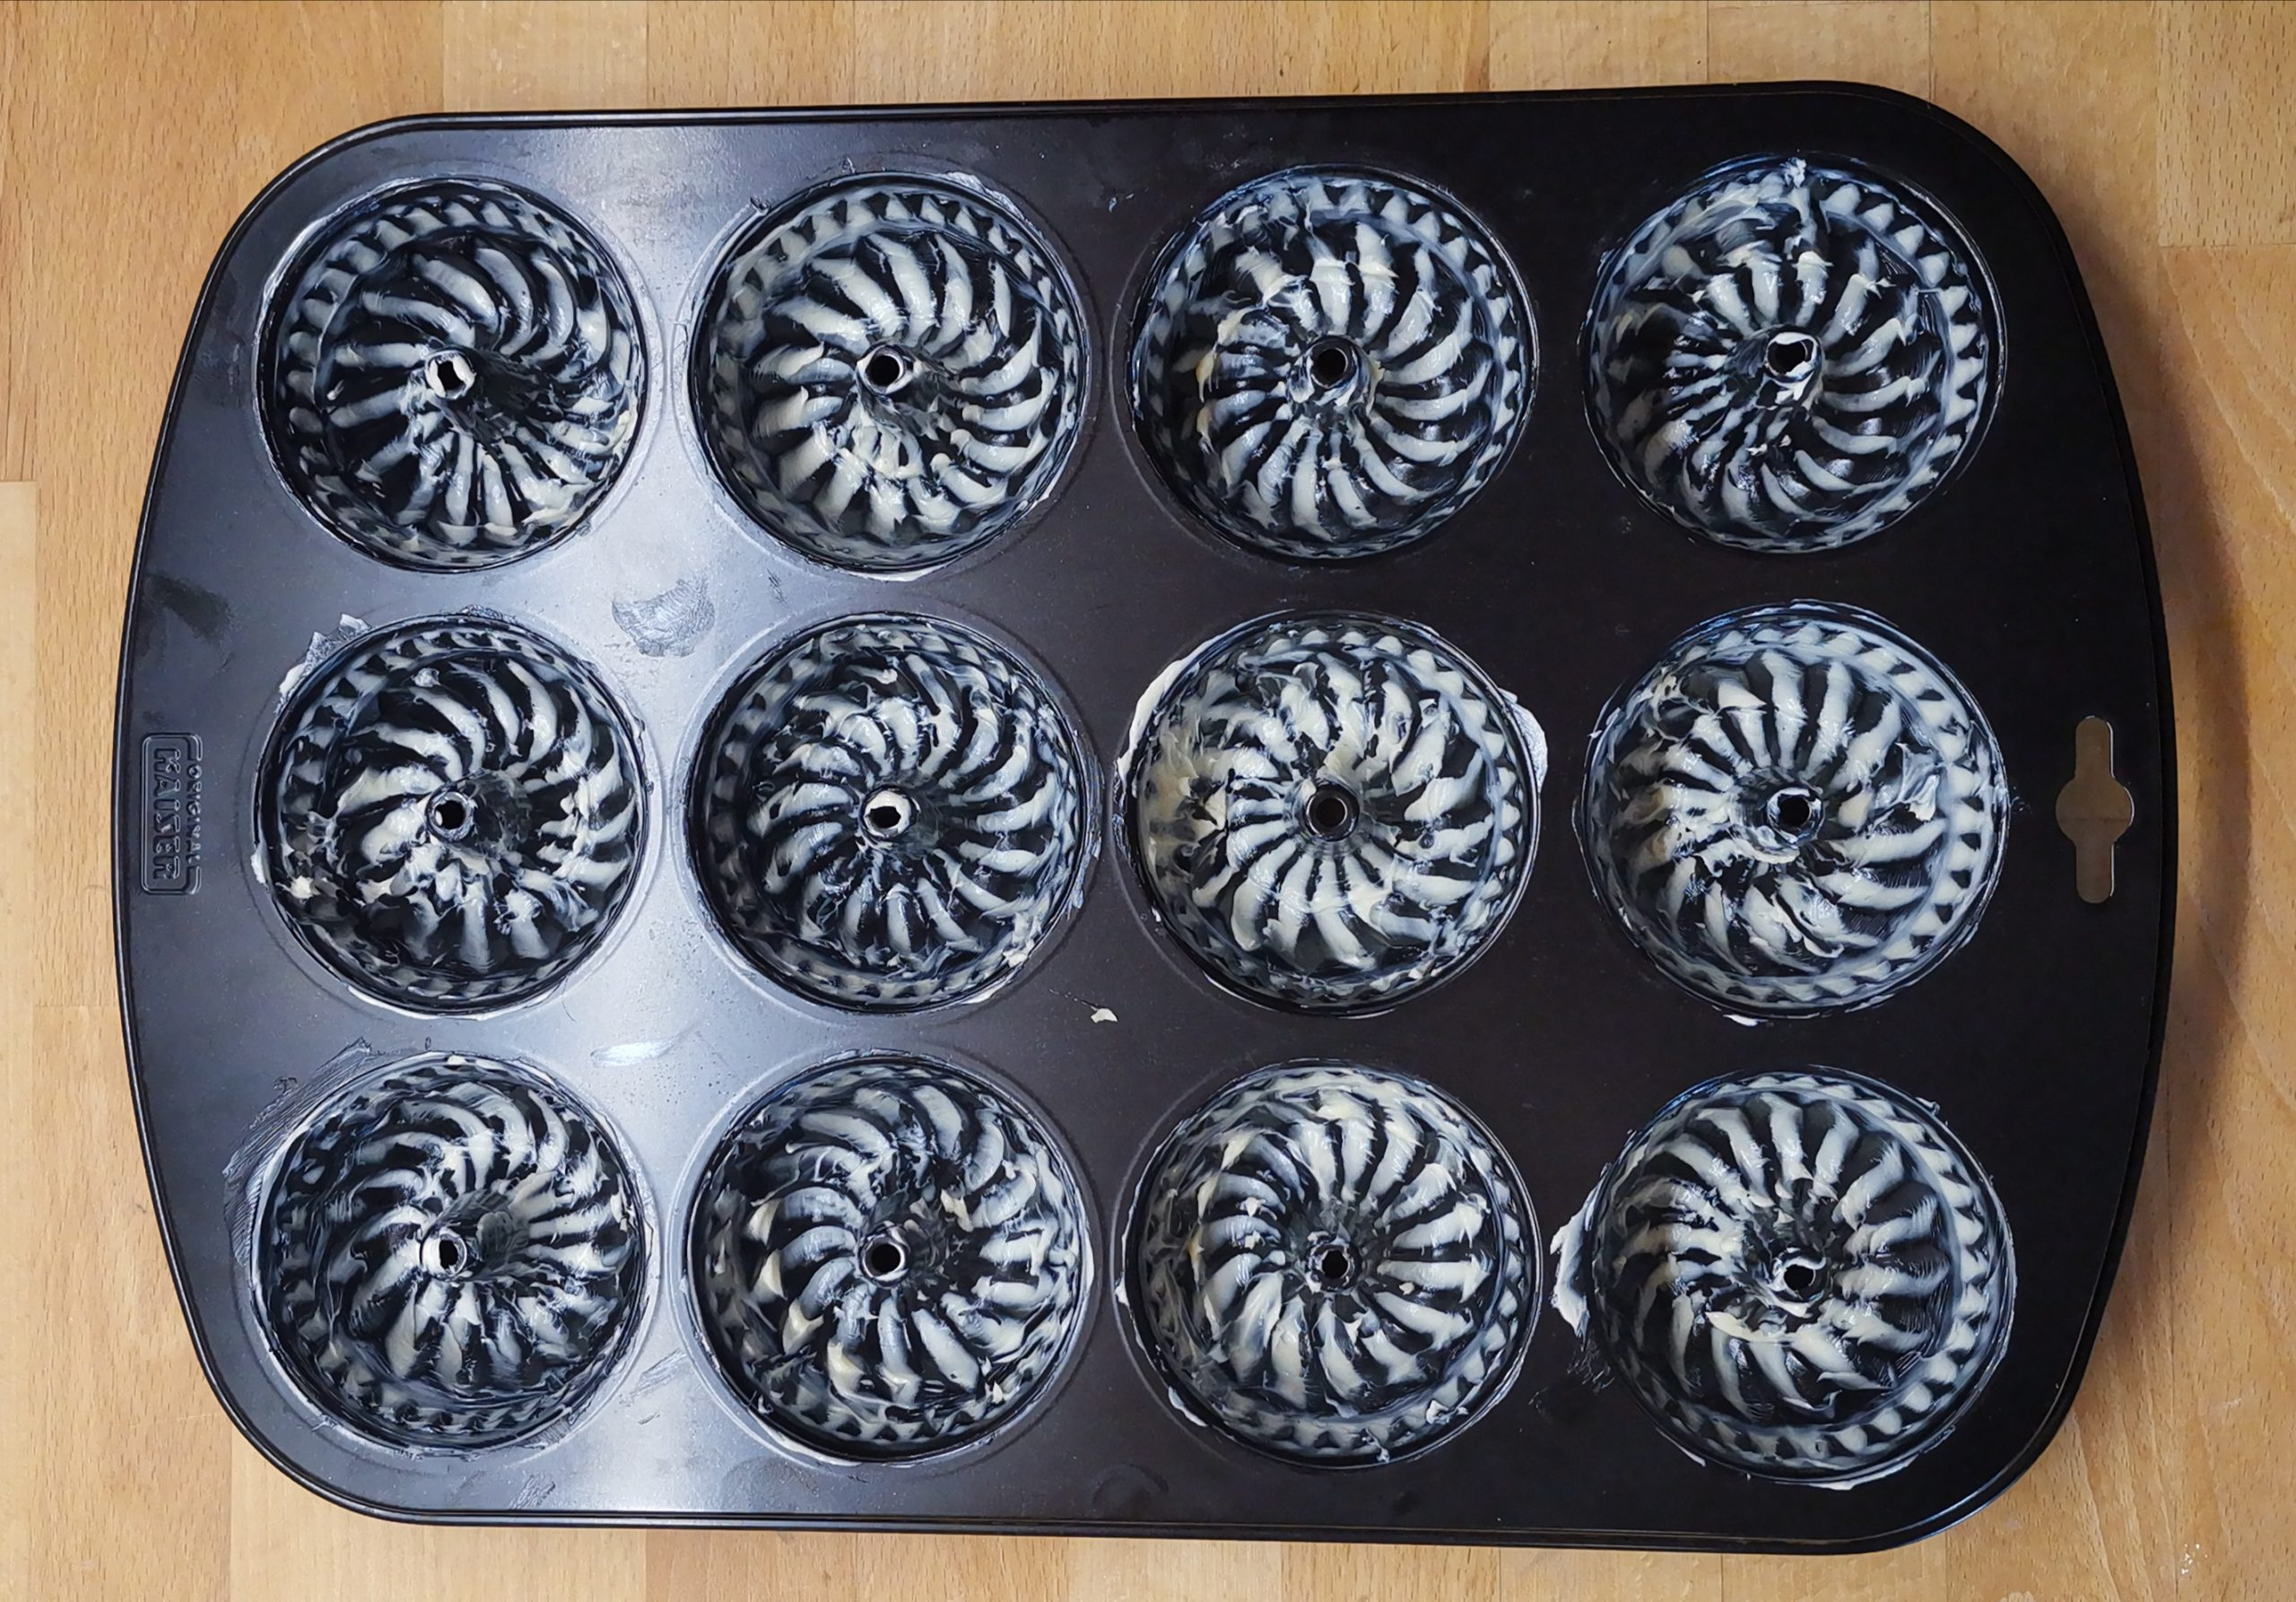 Zitronenmadeleines oder Mini-Gugl Backblech in Vorbereitung